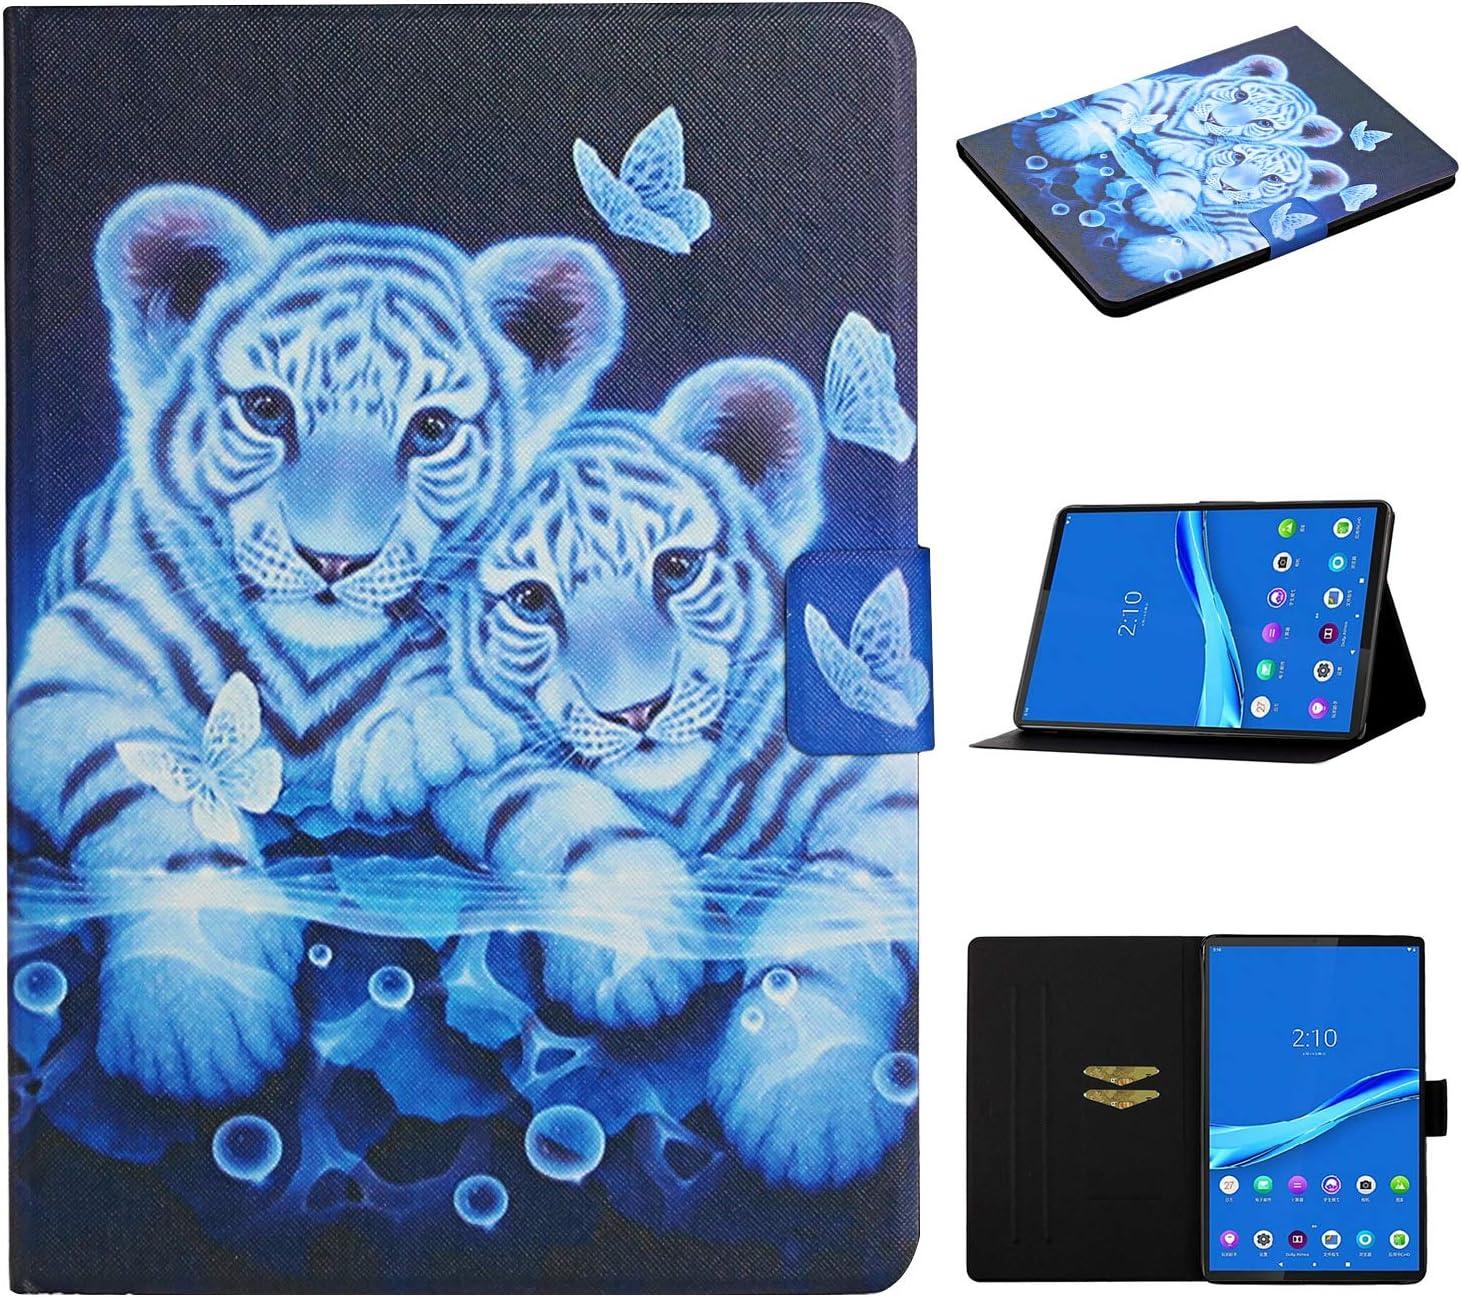 Case for Lenovo Tab M10 Plus (TB-X606F/TB-X606X), Elepower Lightweight Slim Premium PU Leather Folio Stand Cover with Auto Sleep/Wake for Lenovo Tab M10 Plus 10.3